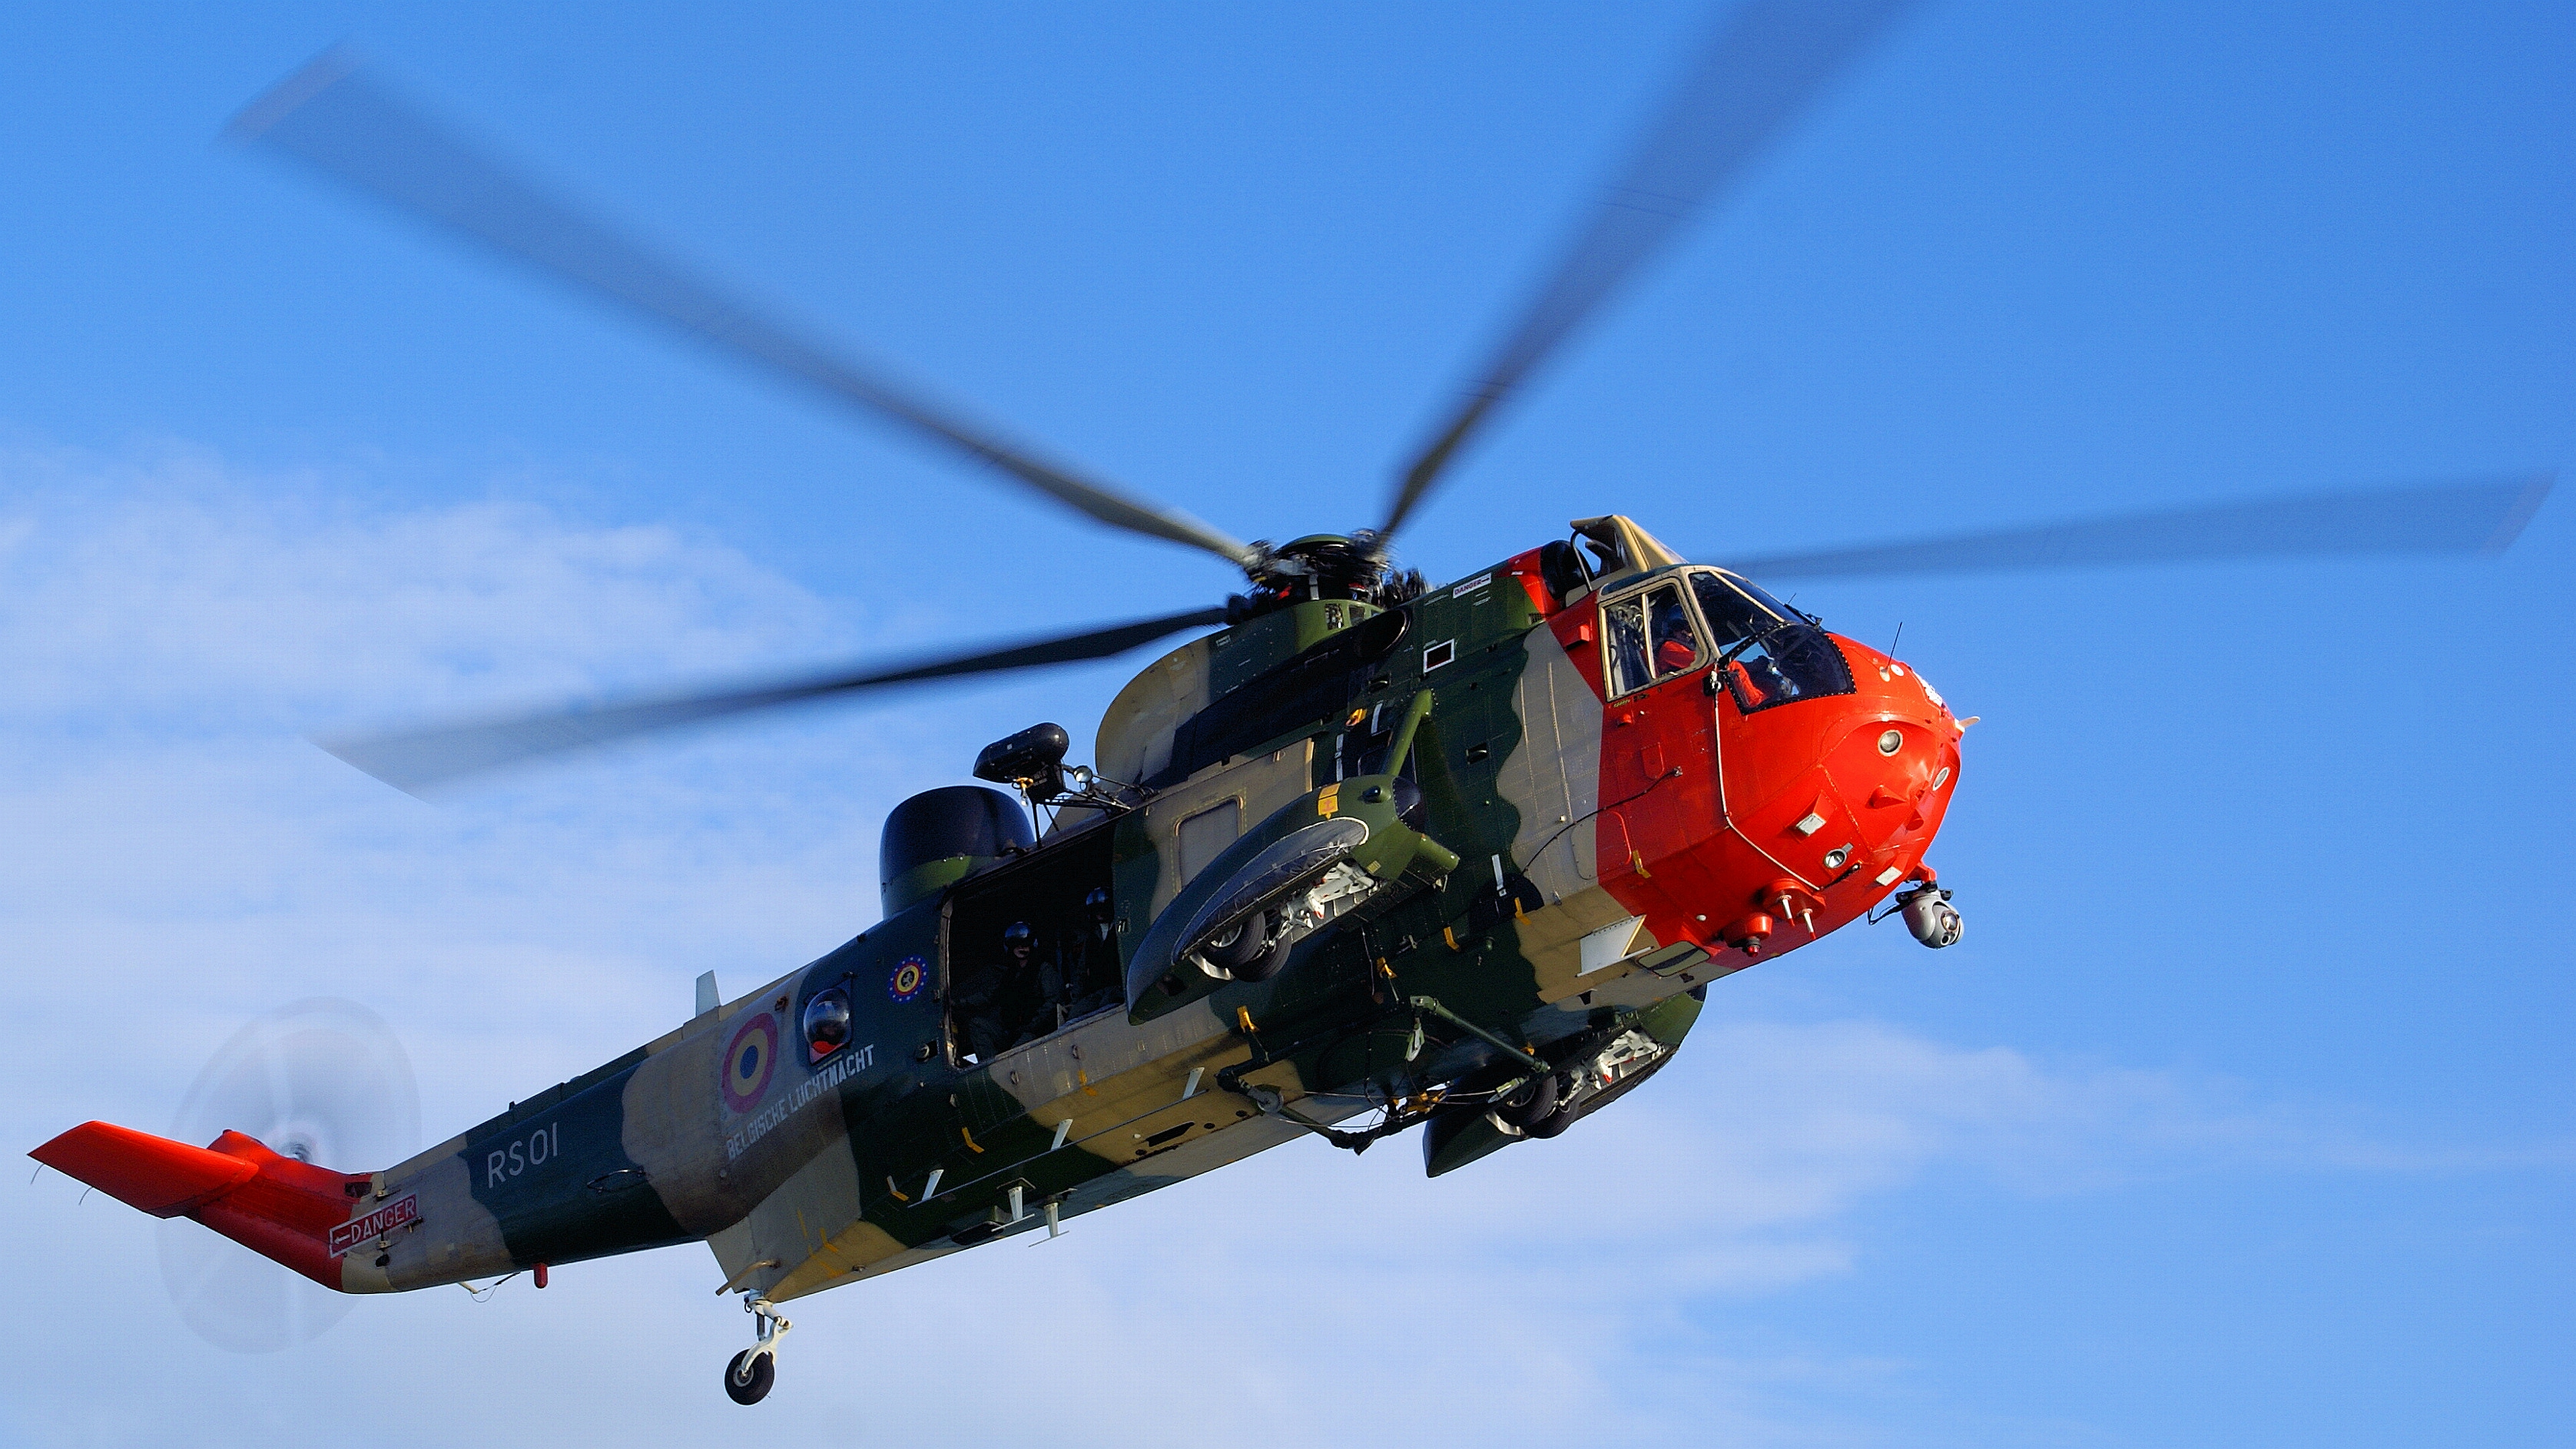 Military Helicopter 4k Hd Desktop Wallpaper For 4k Ultra: AgustaWestland AW109 4k Ultra HD Wallpaper